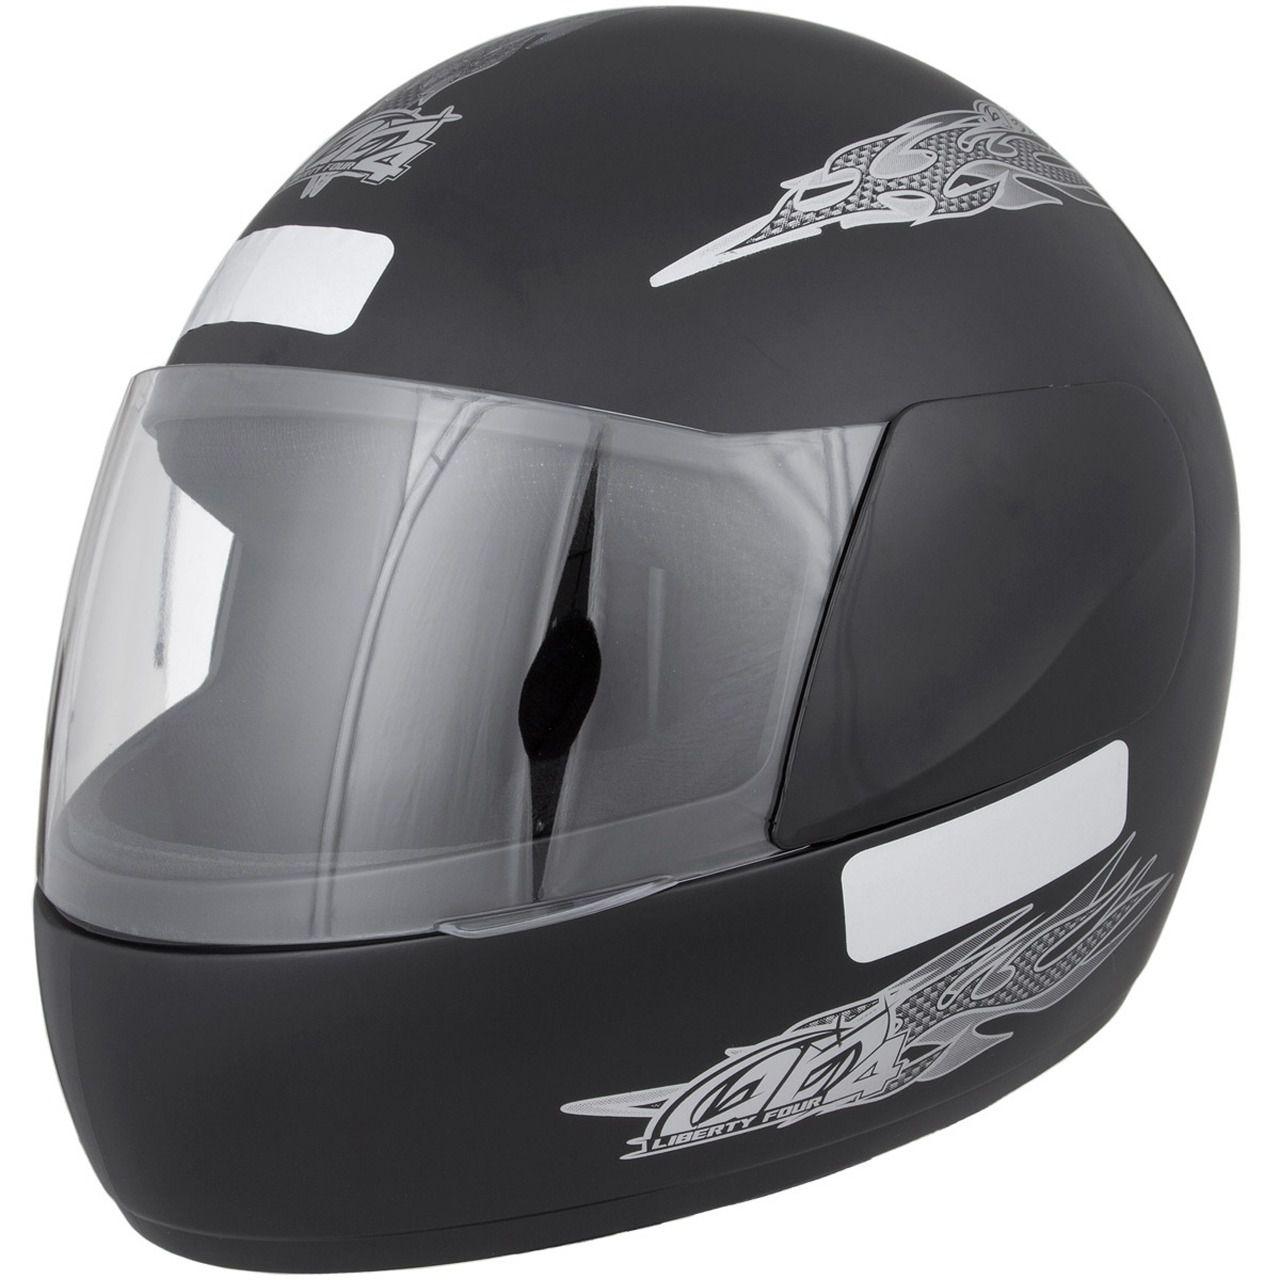 Capacete De Moto Liberty 4 Preto Fosco